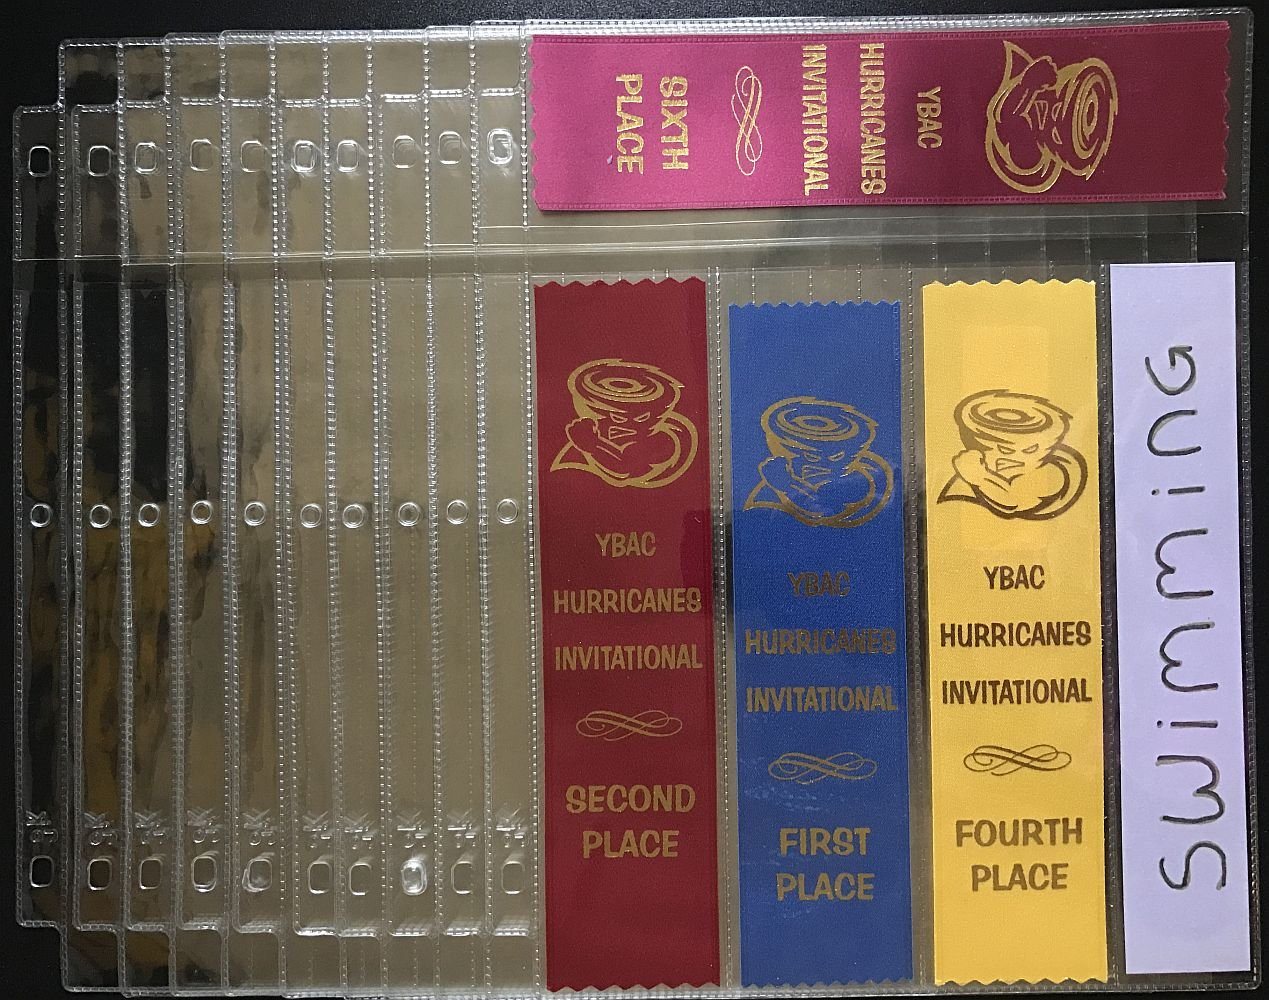 Track and Field 10 Sheets 45 pc store Gymnastics Soccer dog shows and many more award ribbons neatly by GiftKoncepts with BONUS GIFTS Award Ribbon Organizer DIY KIT